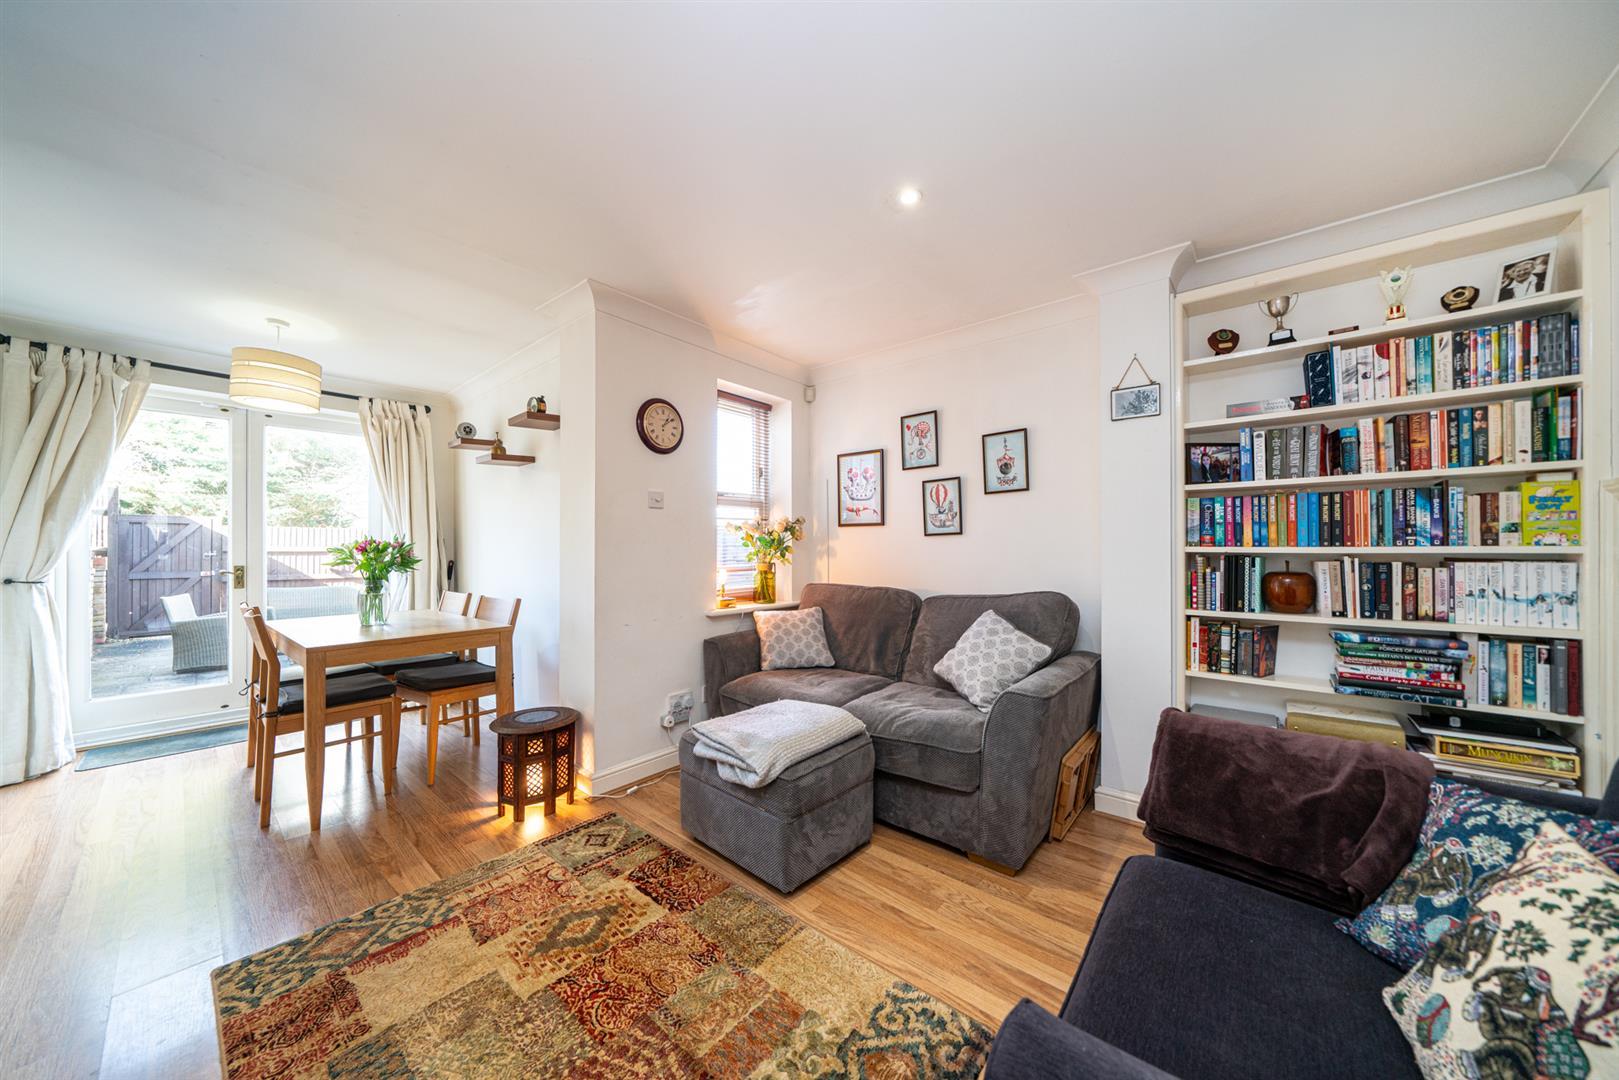 46-Cross-Oak-Road-1010-  living room.jpg